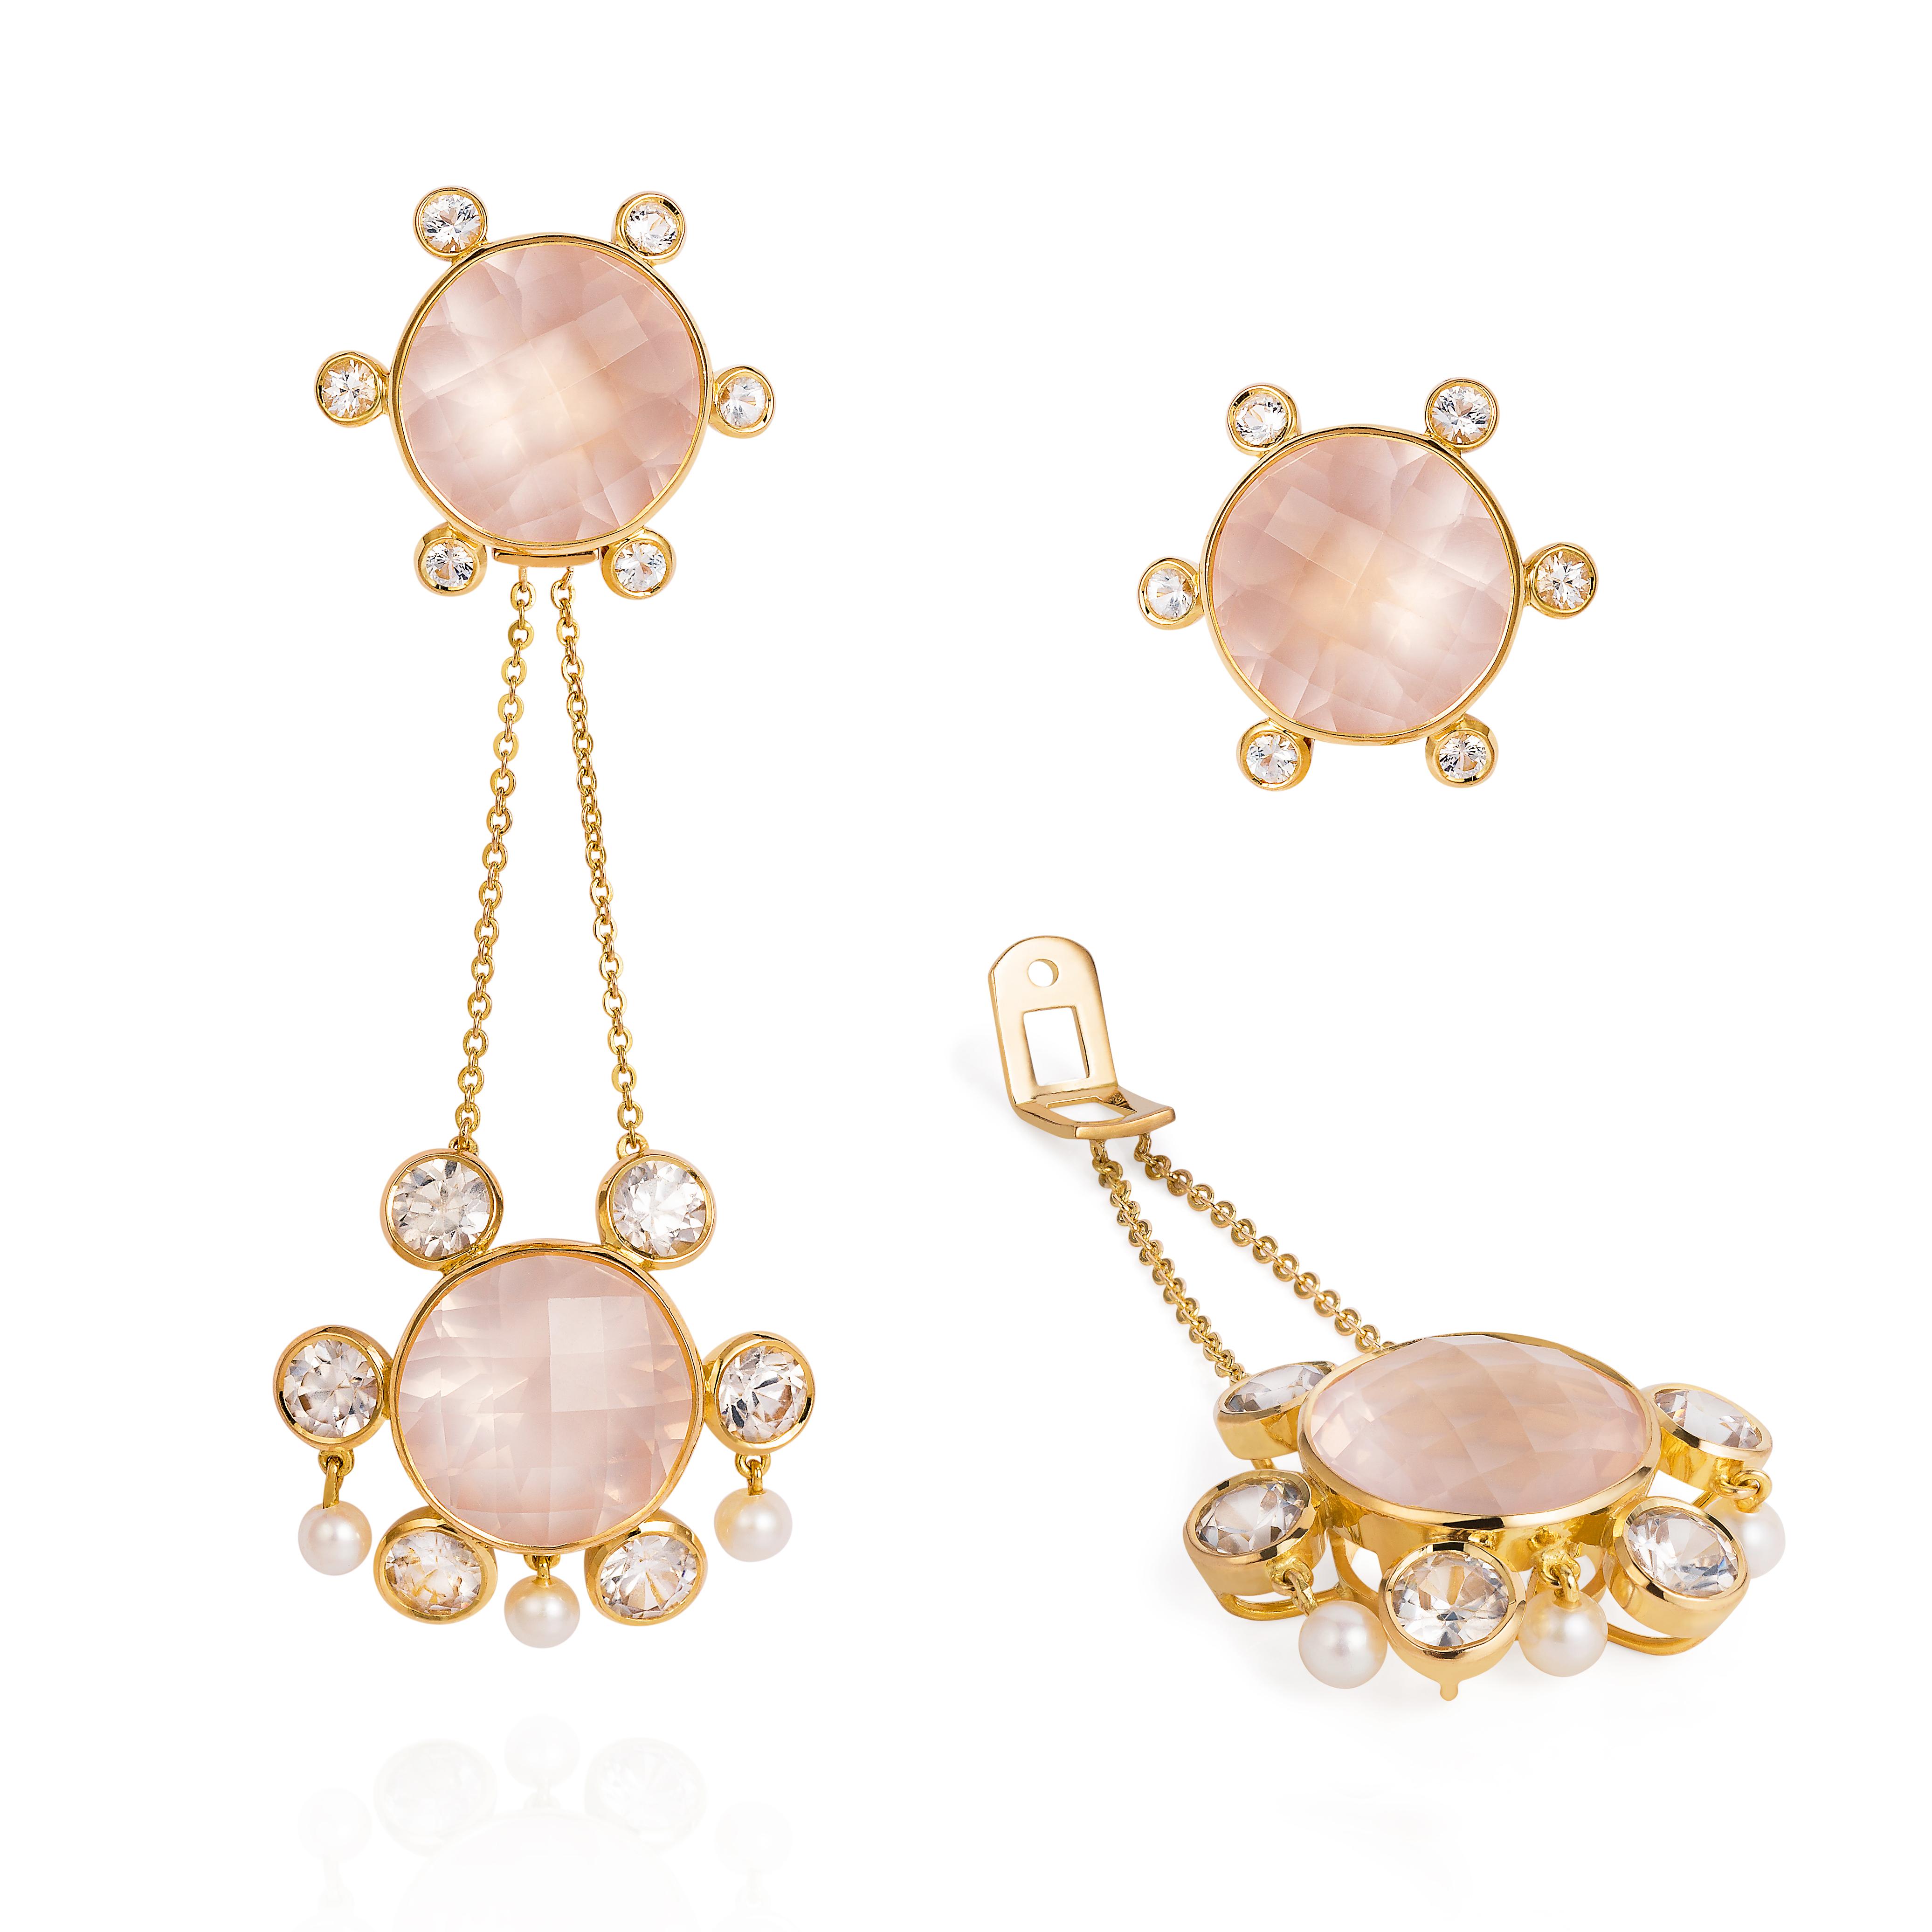 Lantern Earrings  – Rose-quartz, White Sapphires And Baby Pearls 18k Gold